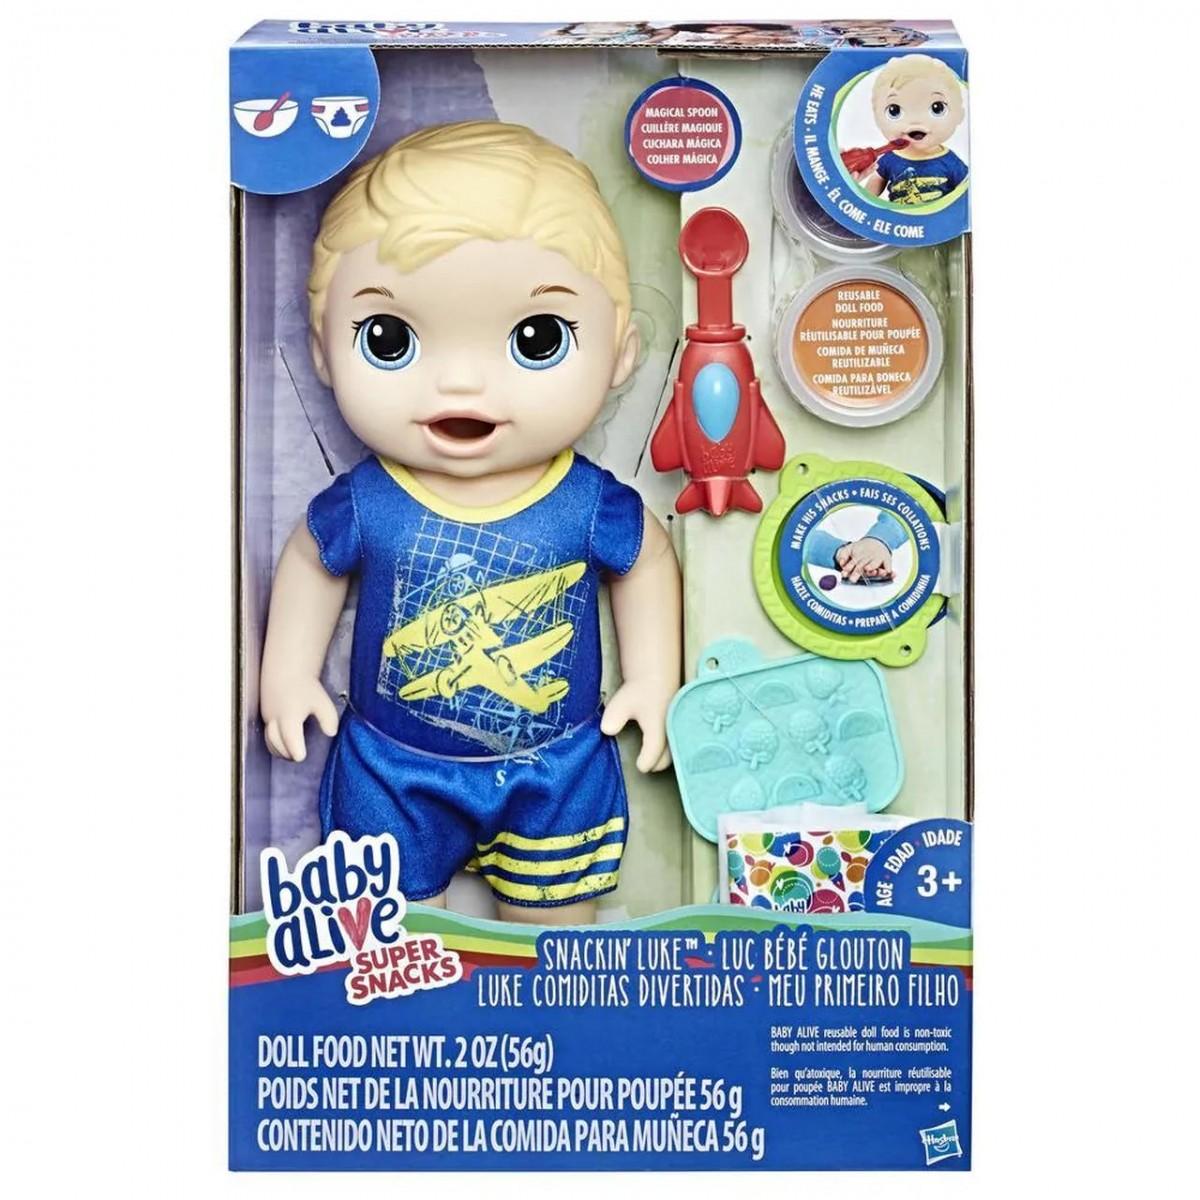 Boneca Baby Alive: Meu Primeiro Filho (Loiro) (Snackin Luke)